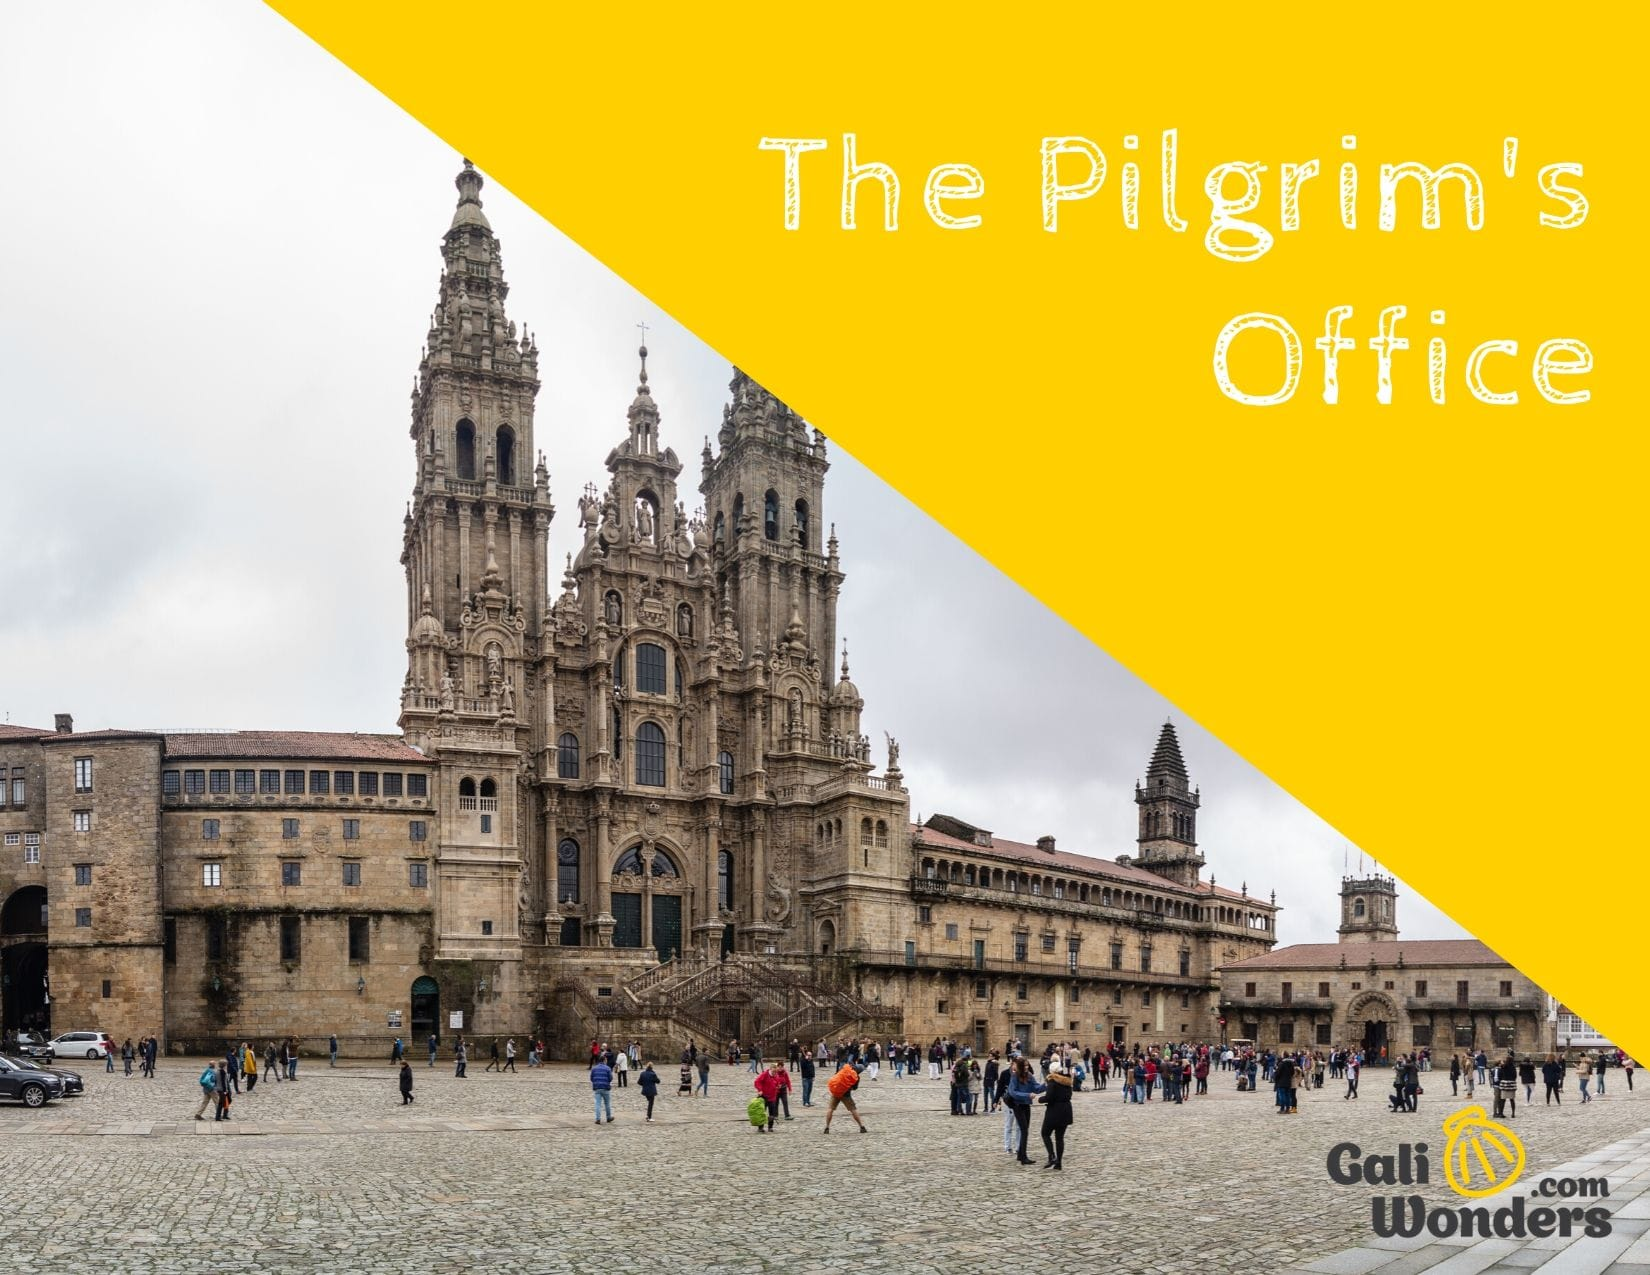 Pilgrim's office Galiwonders